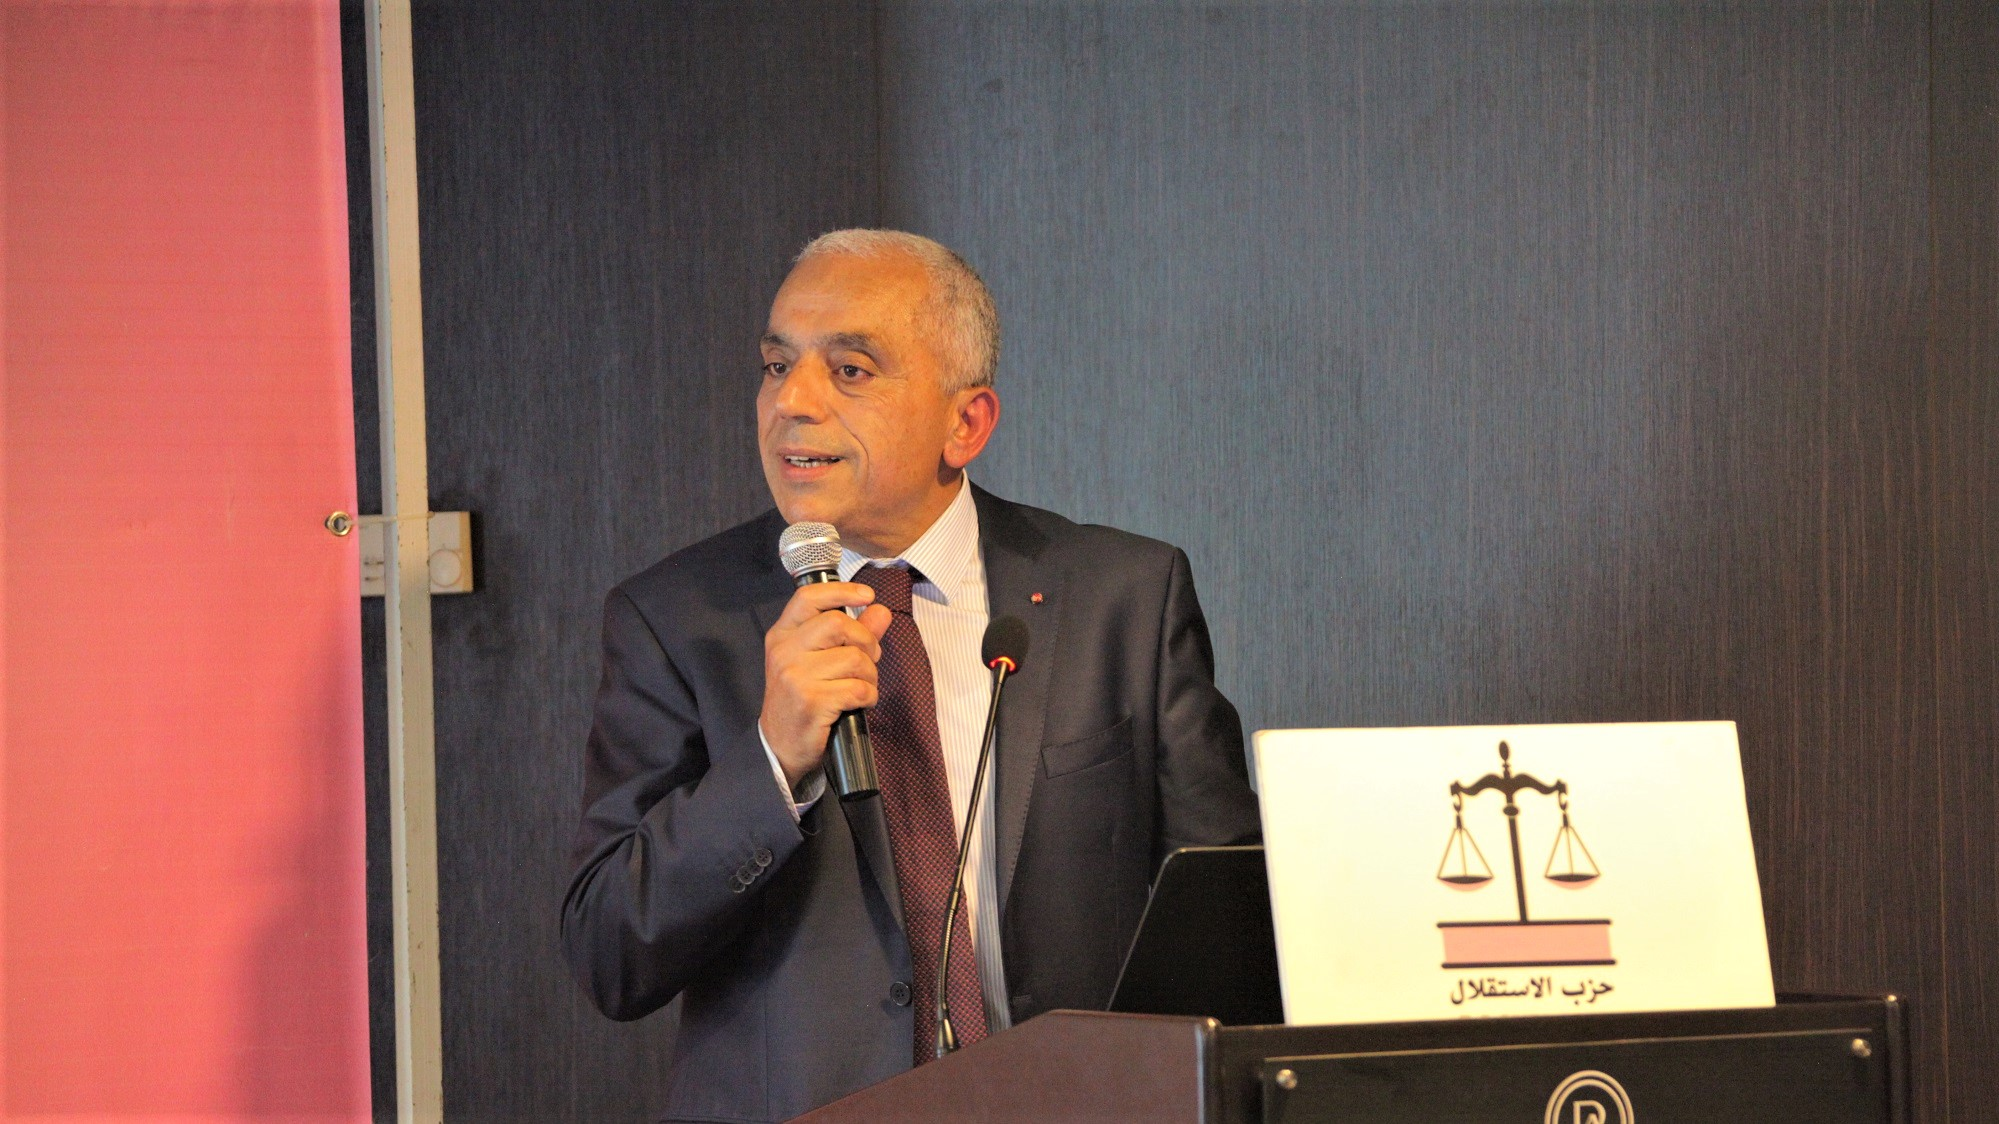 ABDELLATIF MAAZOUZ, PRÉSIDENT DE L'ALLIANCE DES ECONOMISTES ISTIQLALIENS (AEI)